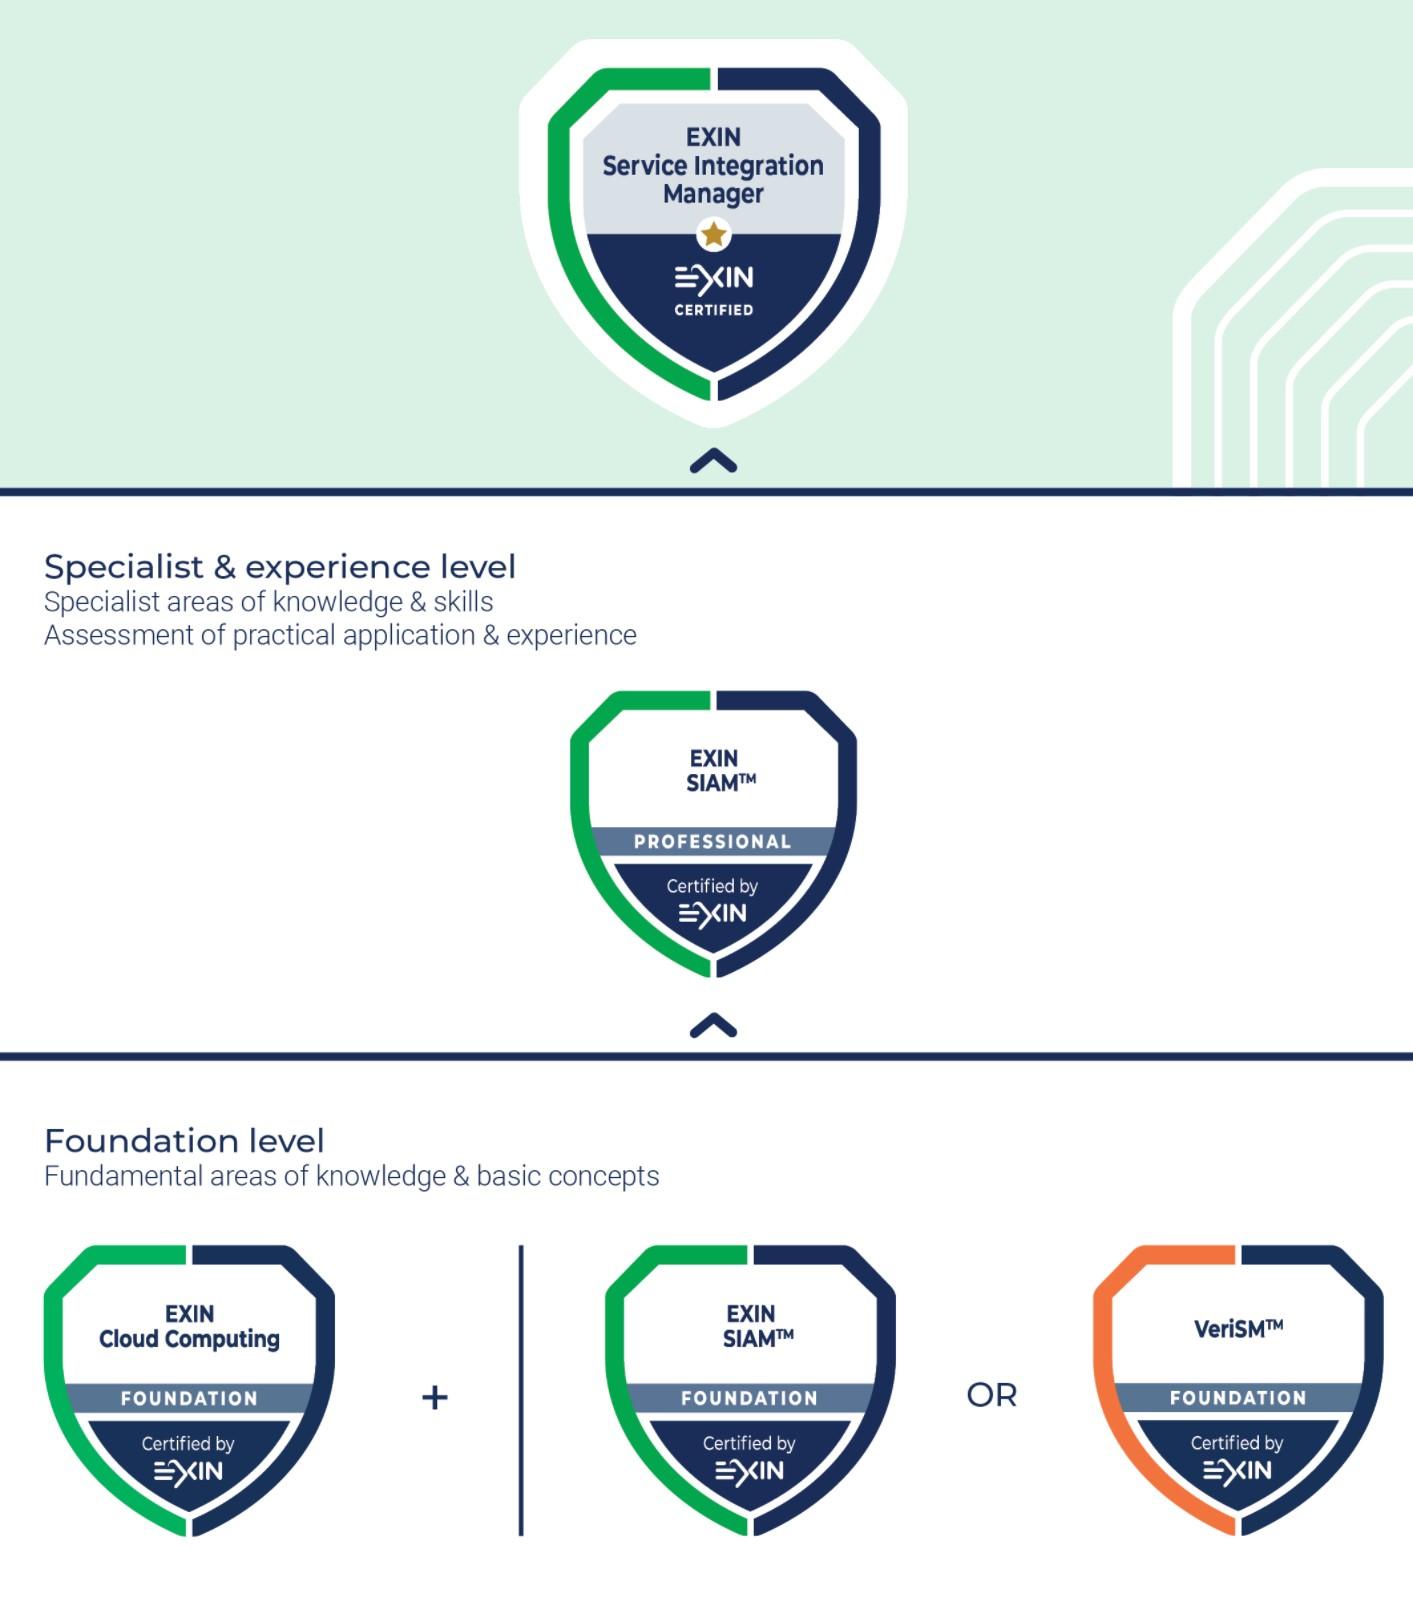 Service Integration Manager Certification